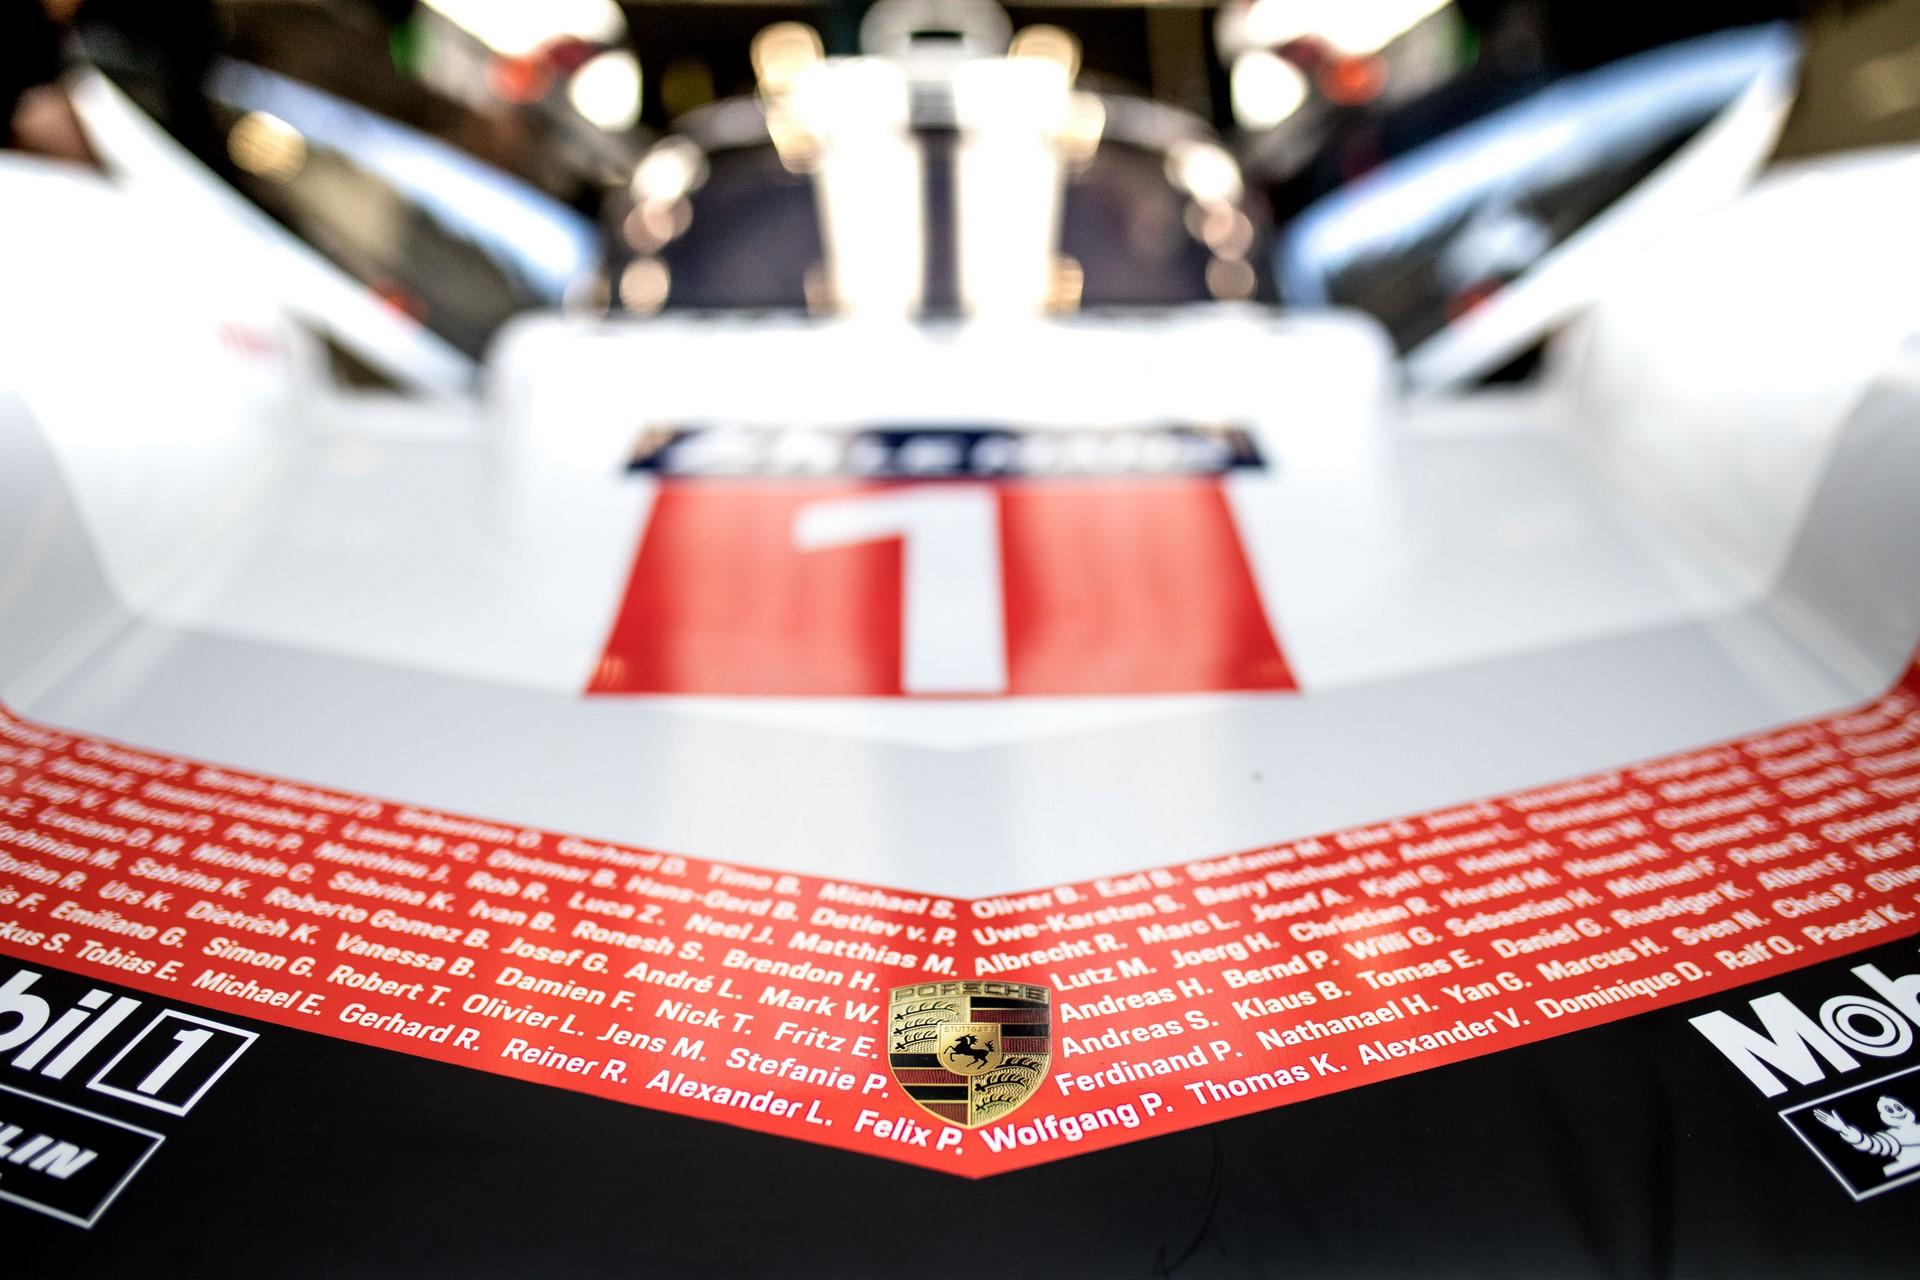 Porsche 919 Hybrid Evo Spa Record (31)